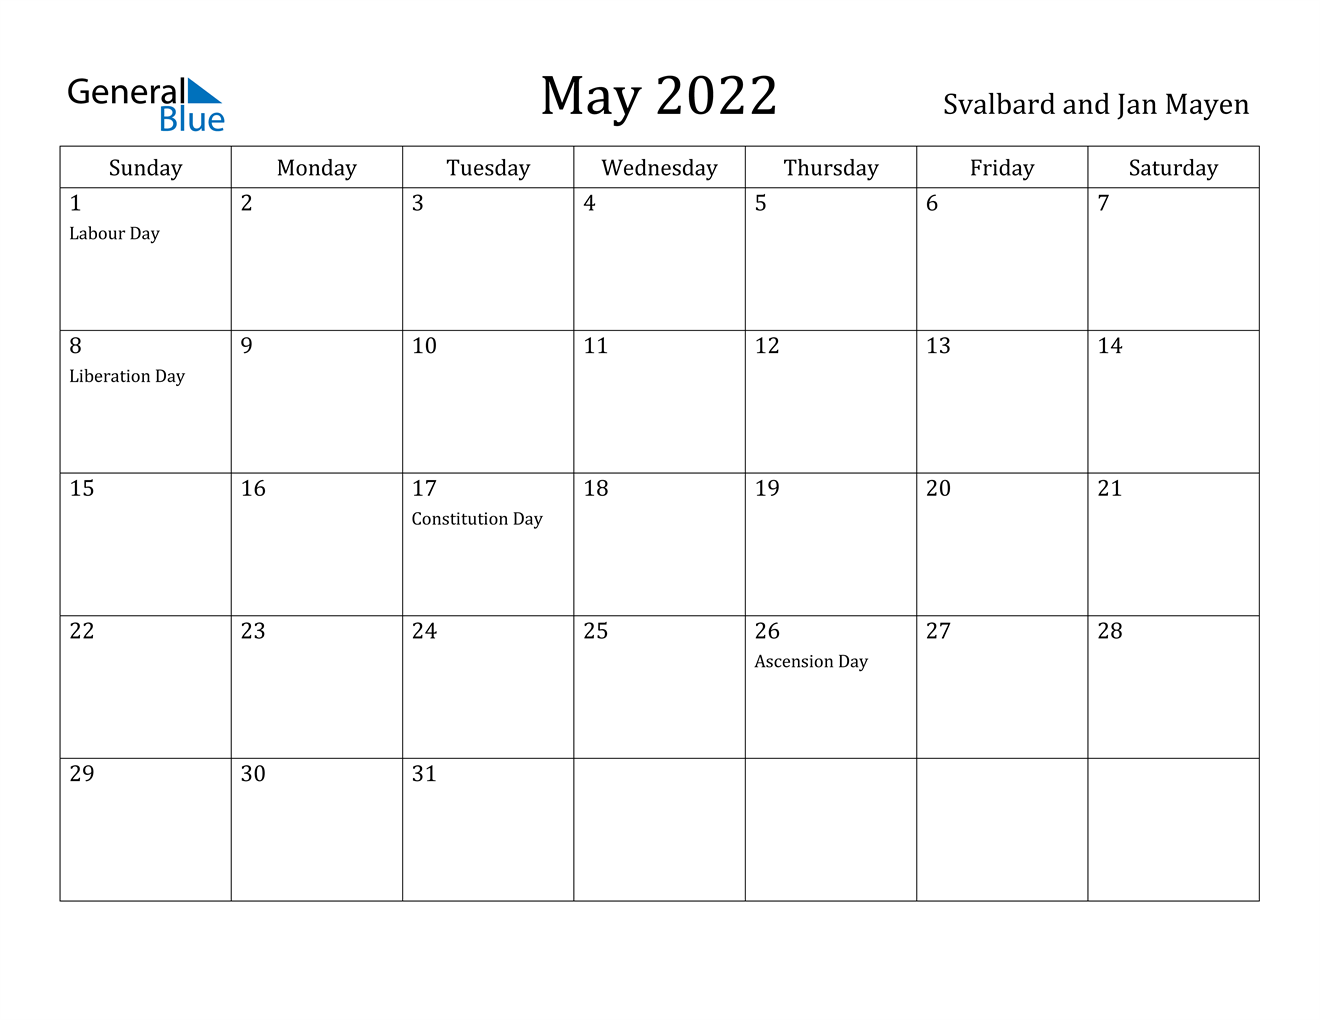 May 2022 Calendar - Svalbard and Jan Mayen